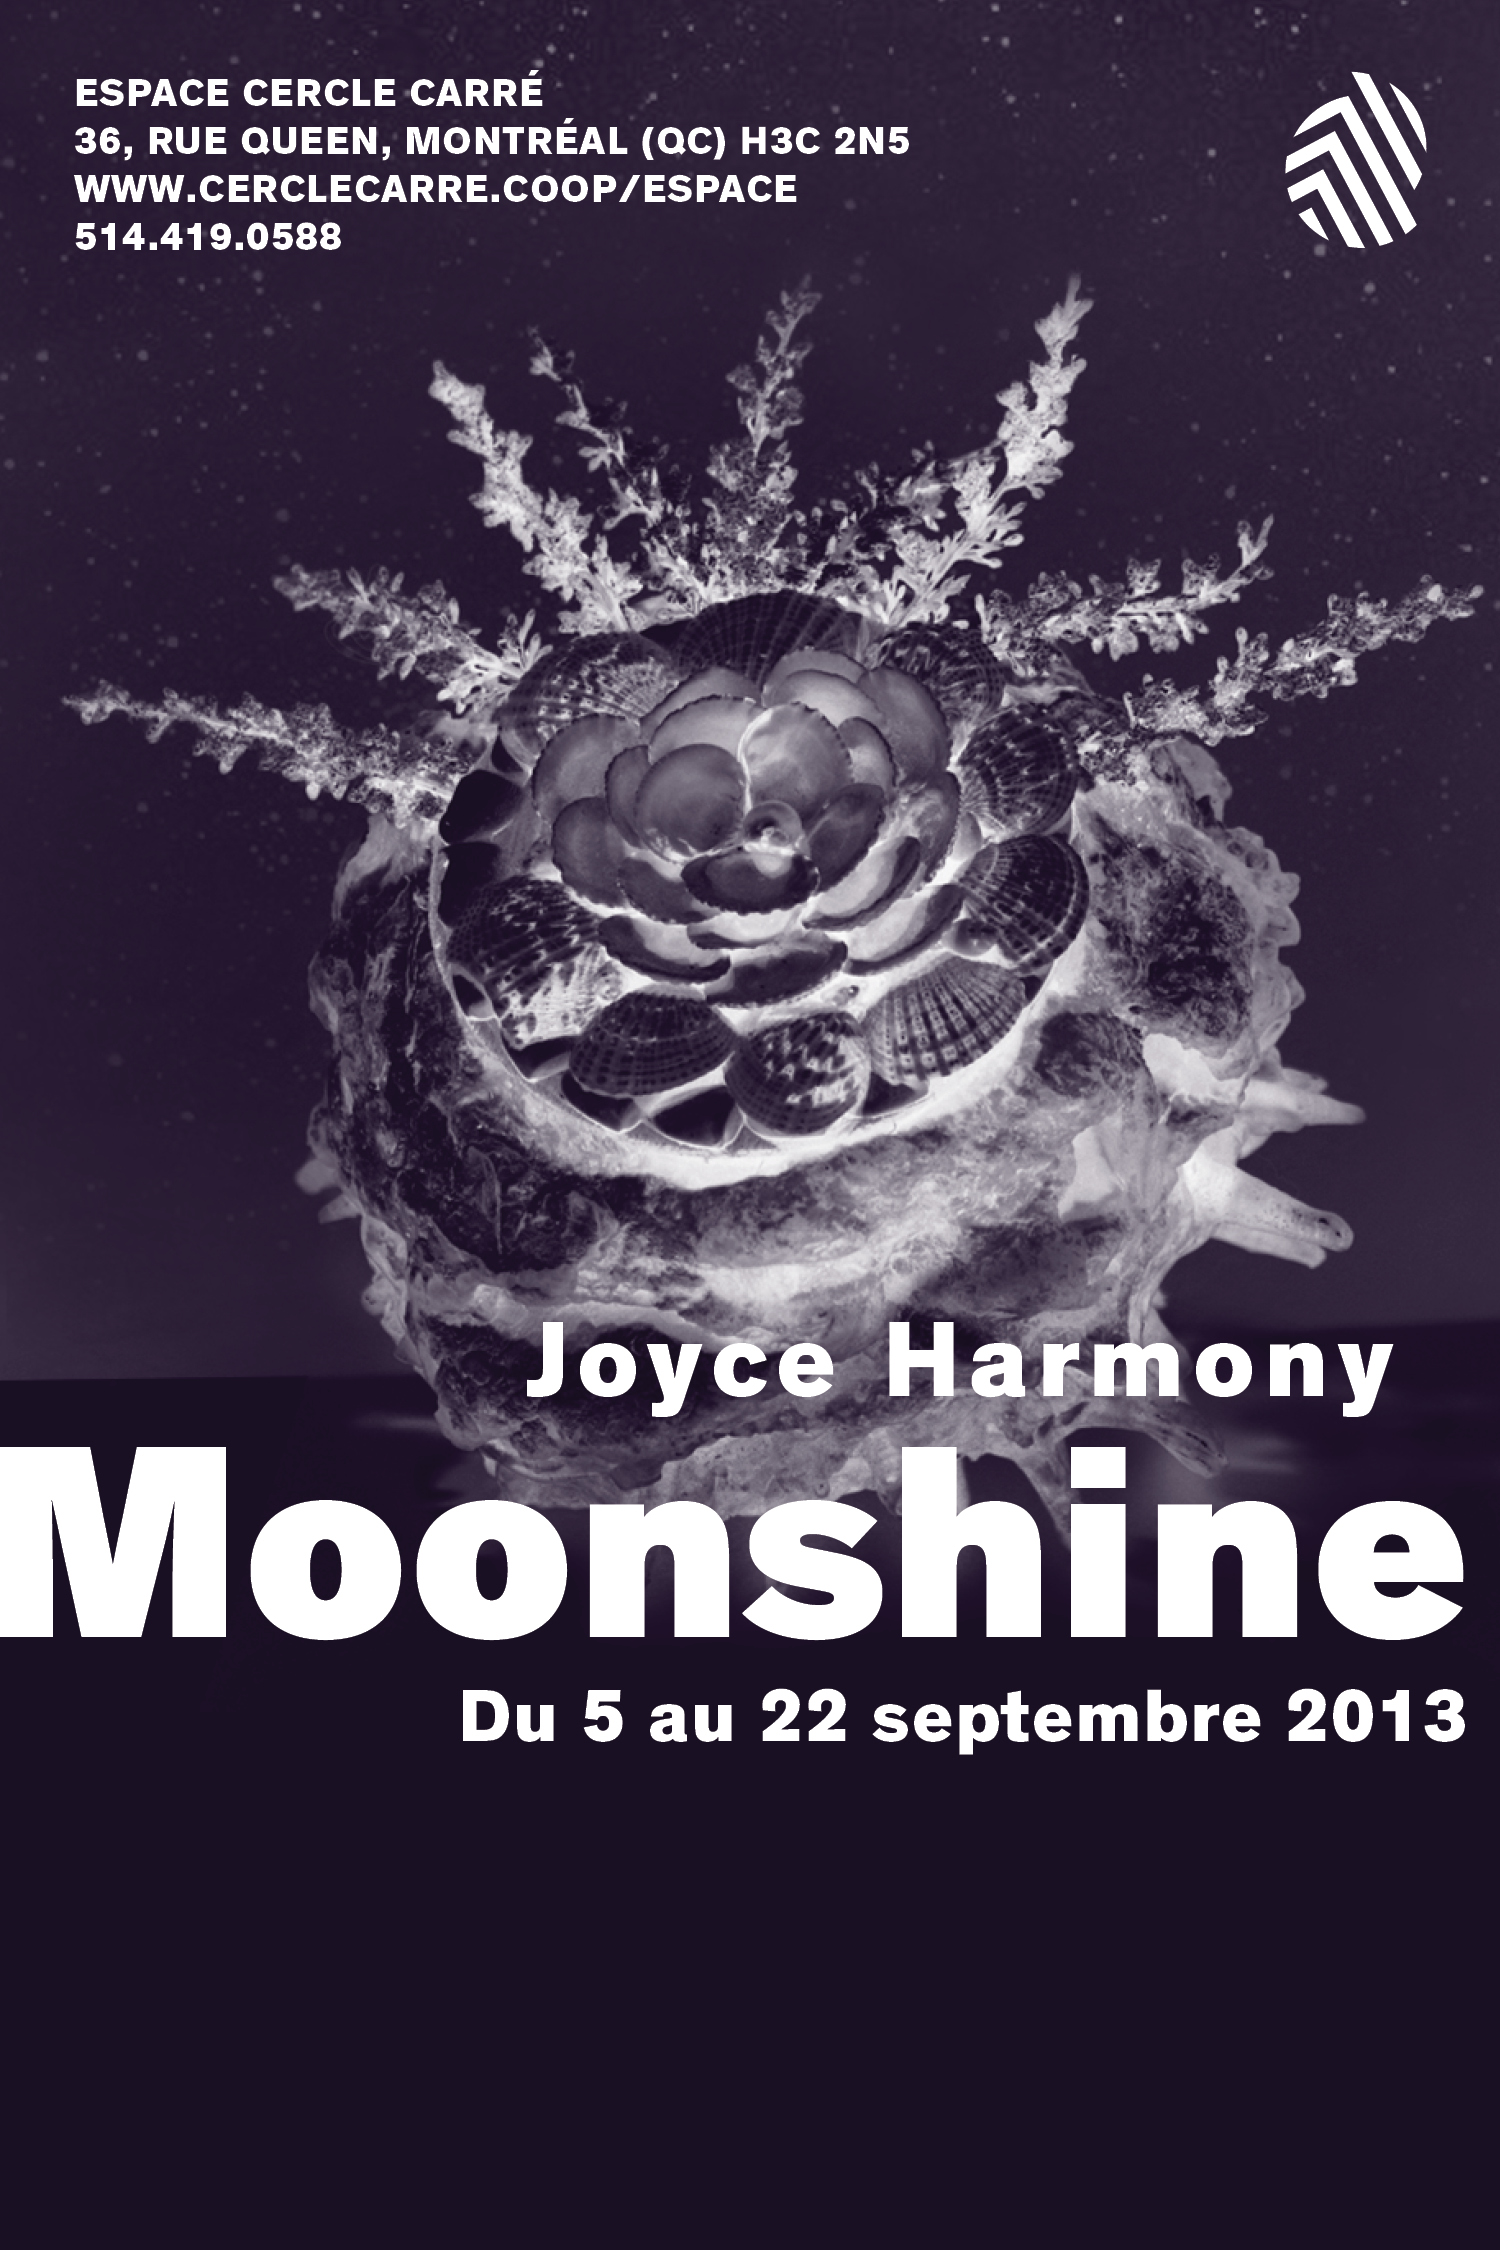 joyce_harmony_invitation_highresolution